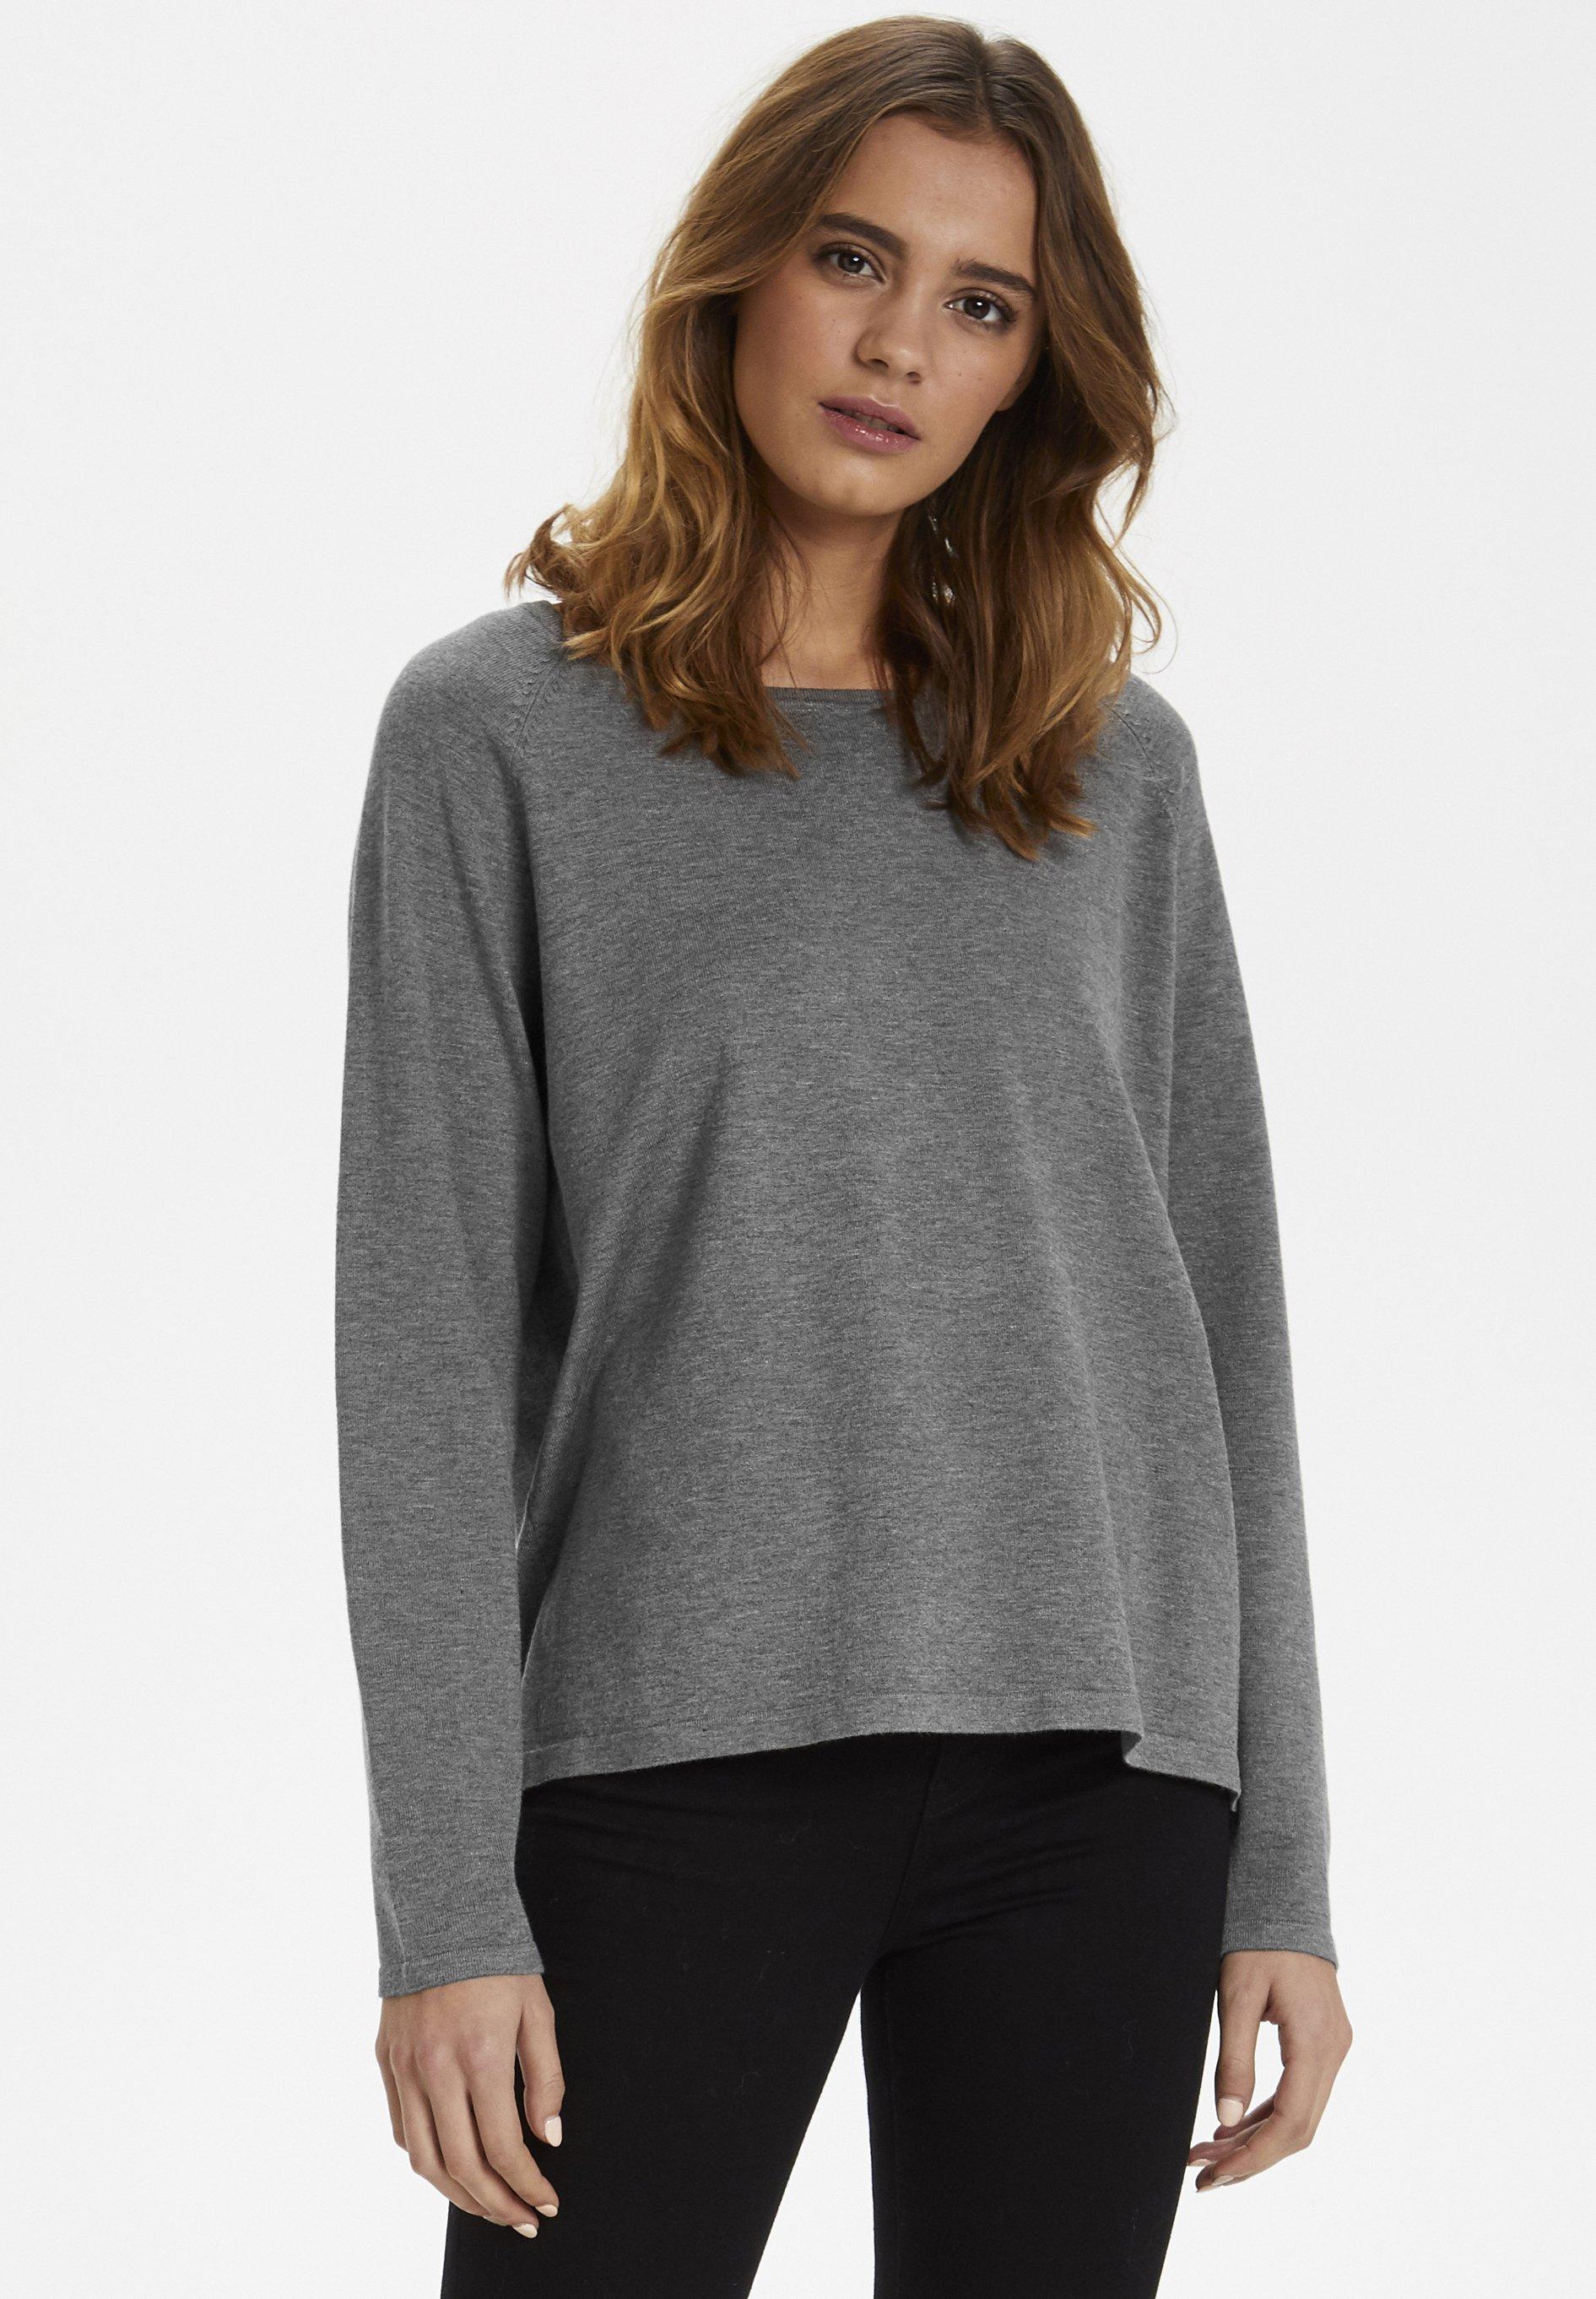 Culture ANNE MARIE - Pullover - mid grey melange - Pulls & Gilets Femme PChpw